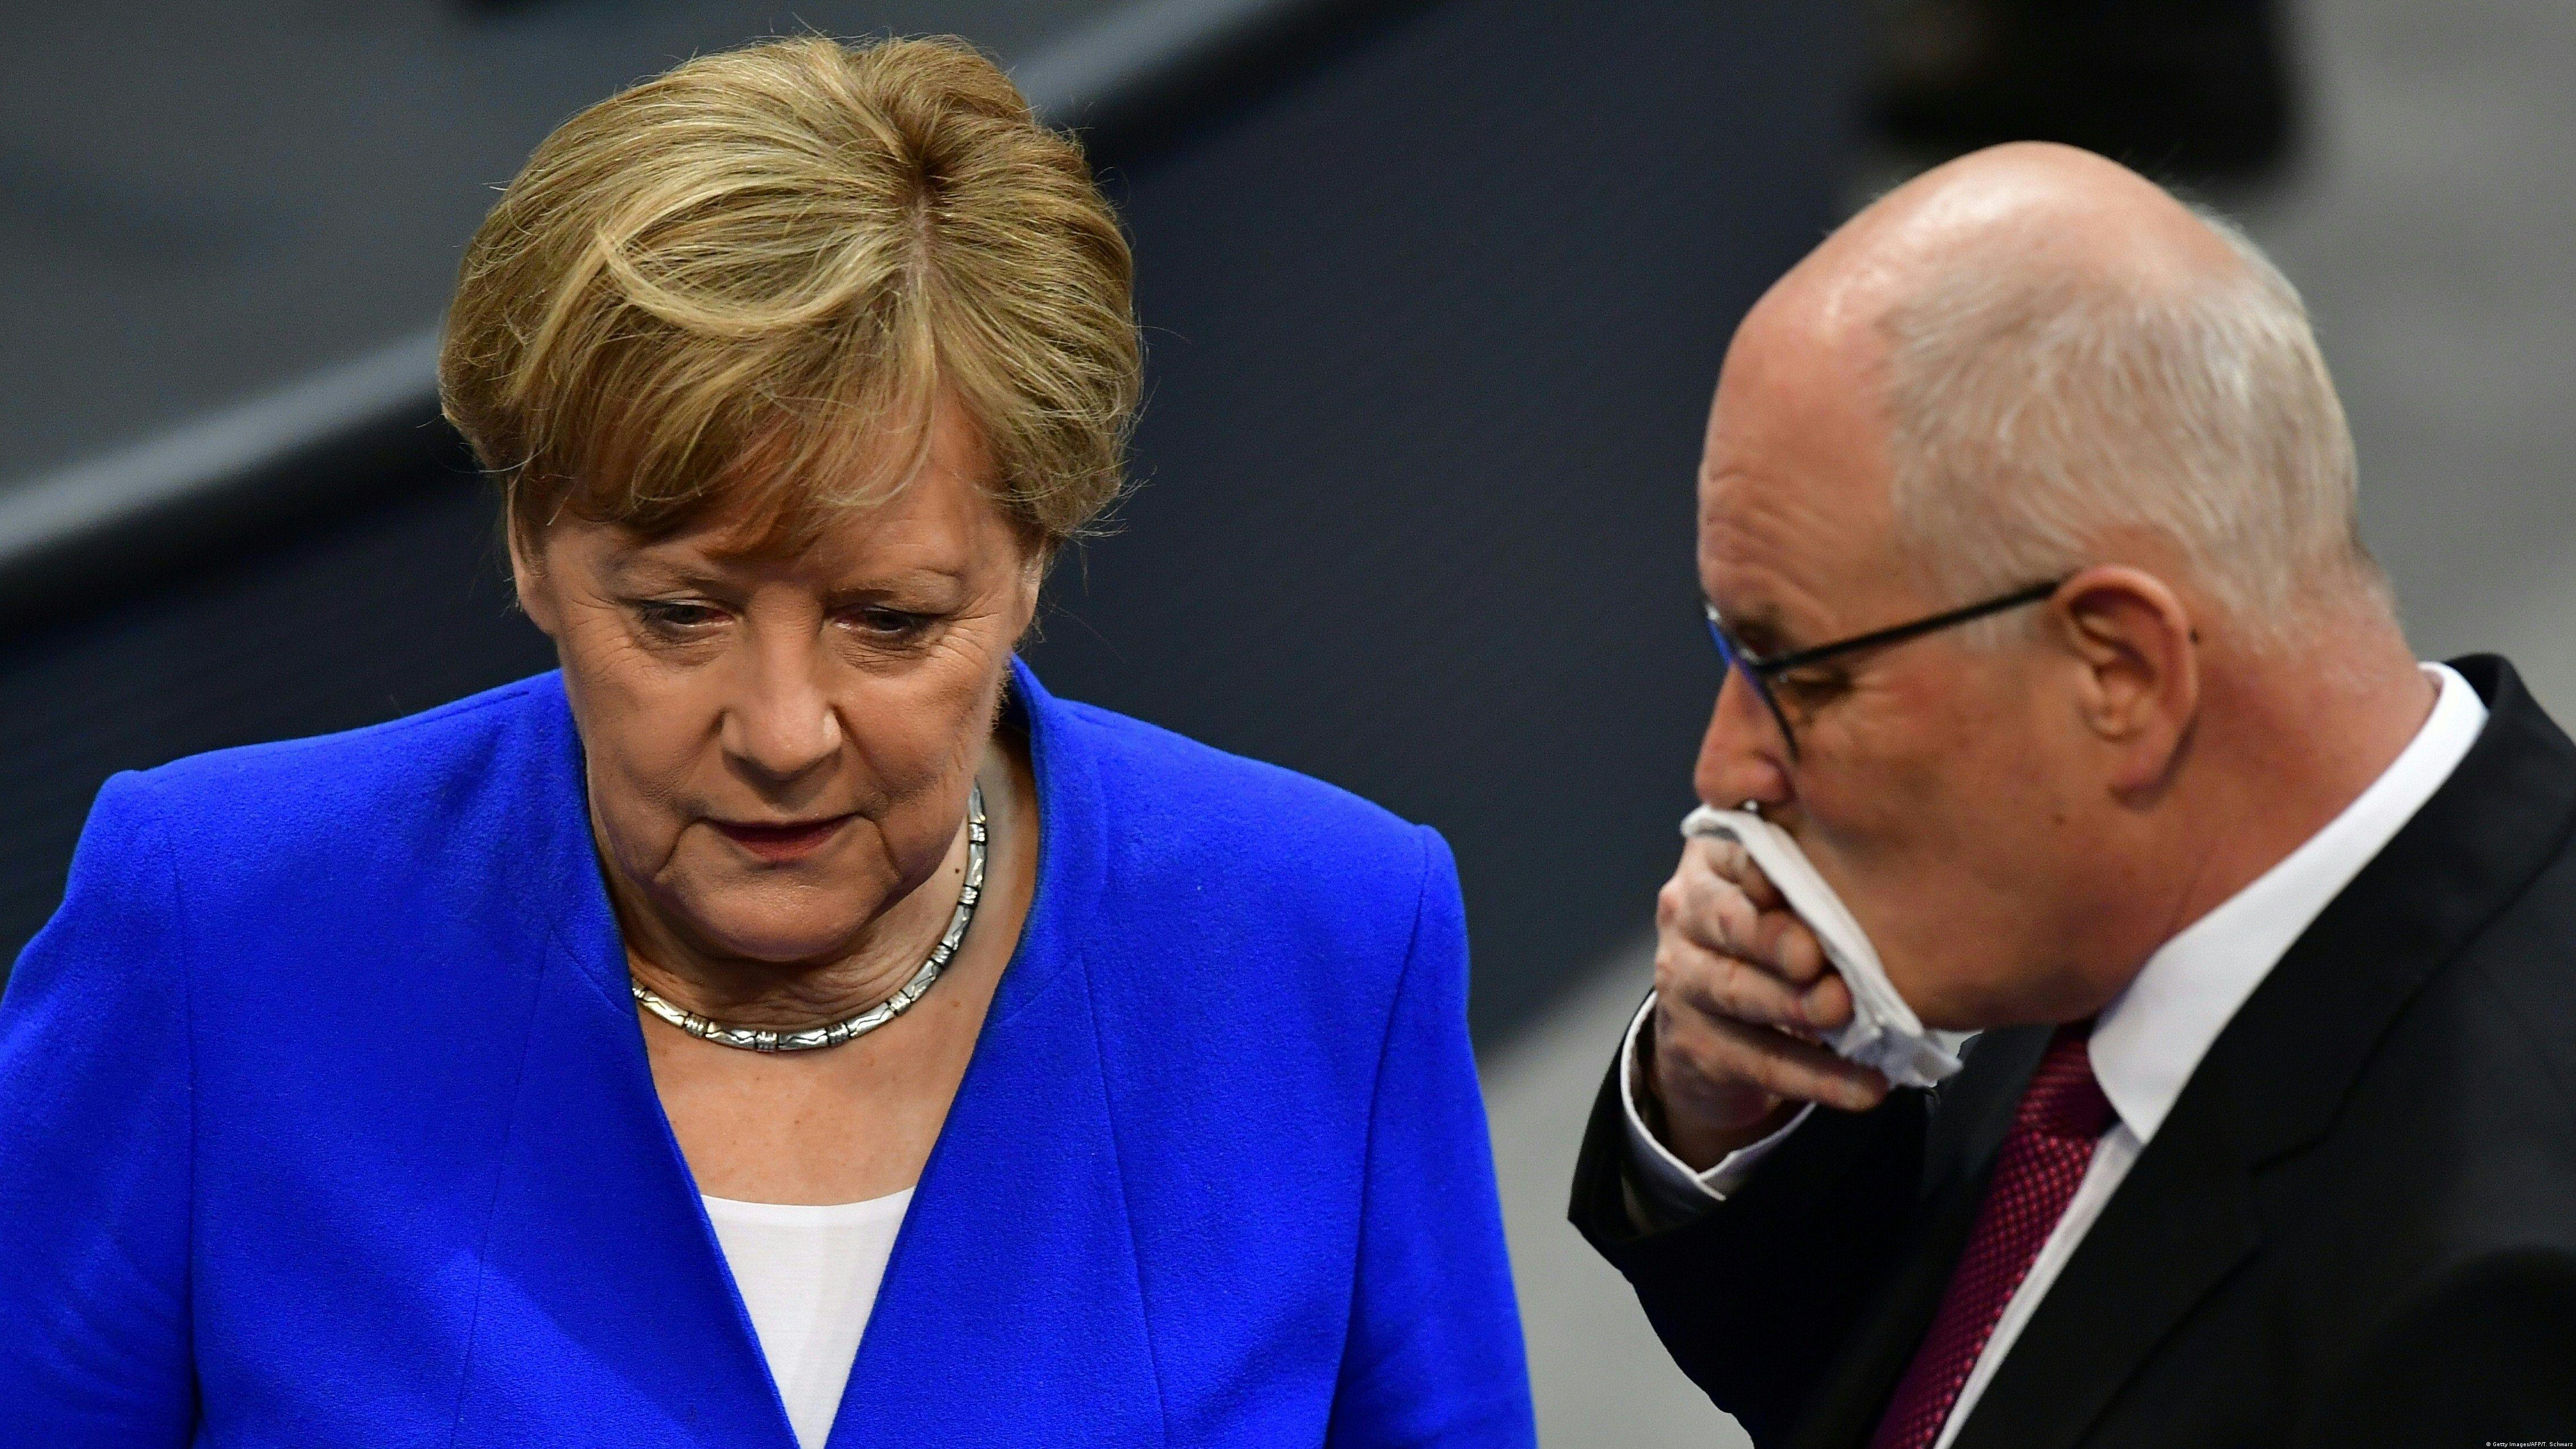 Almanya'da Merkel'in otoritesini sarsan siyasi deprem